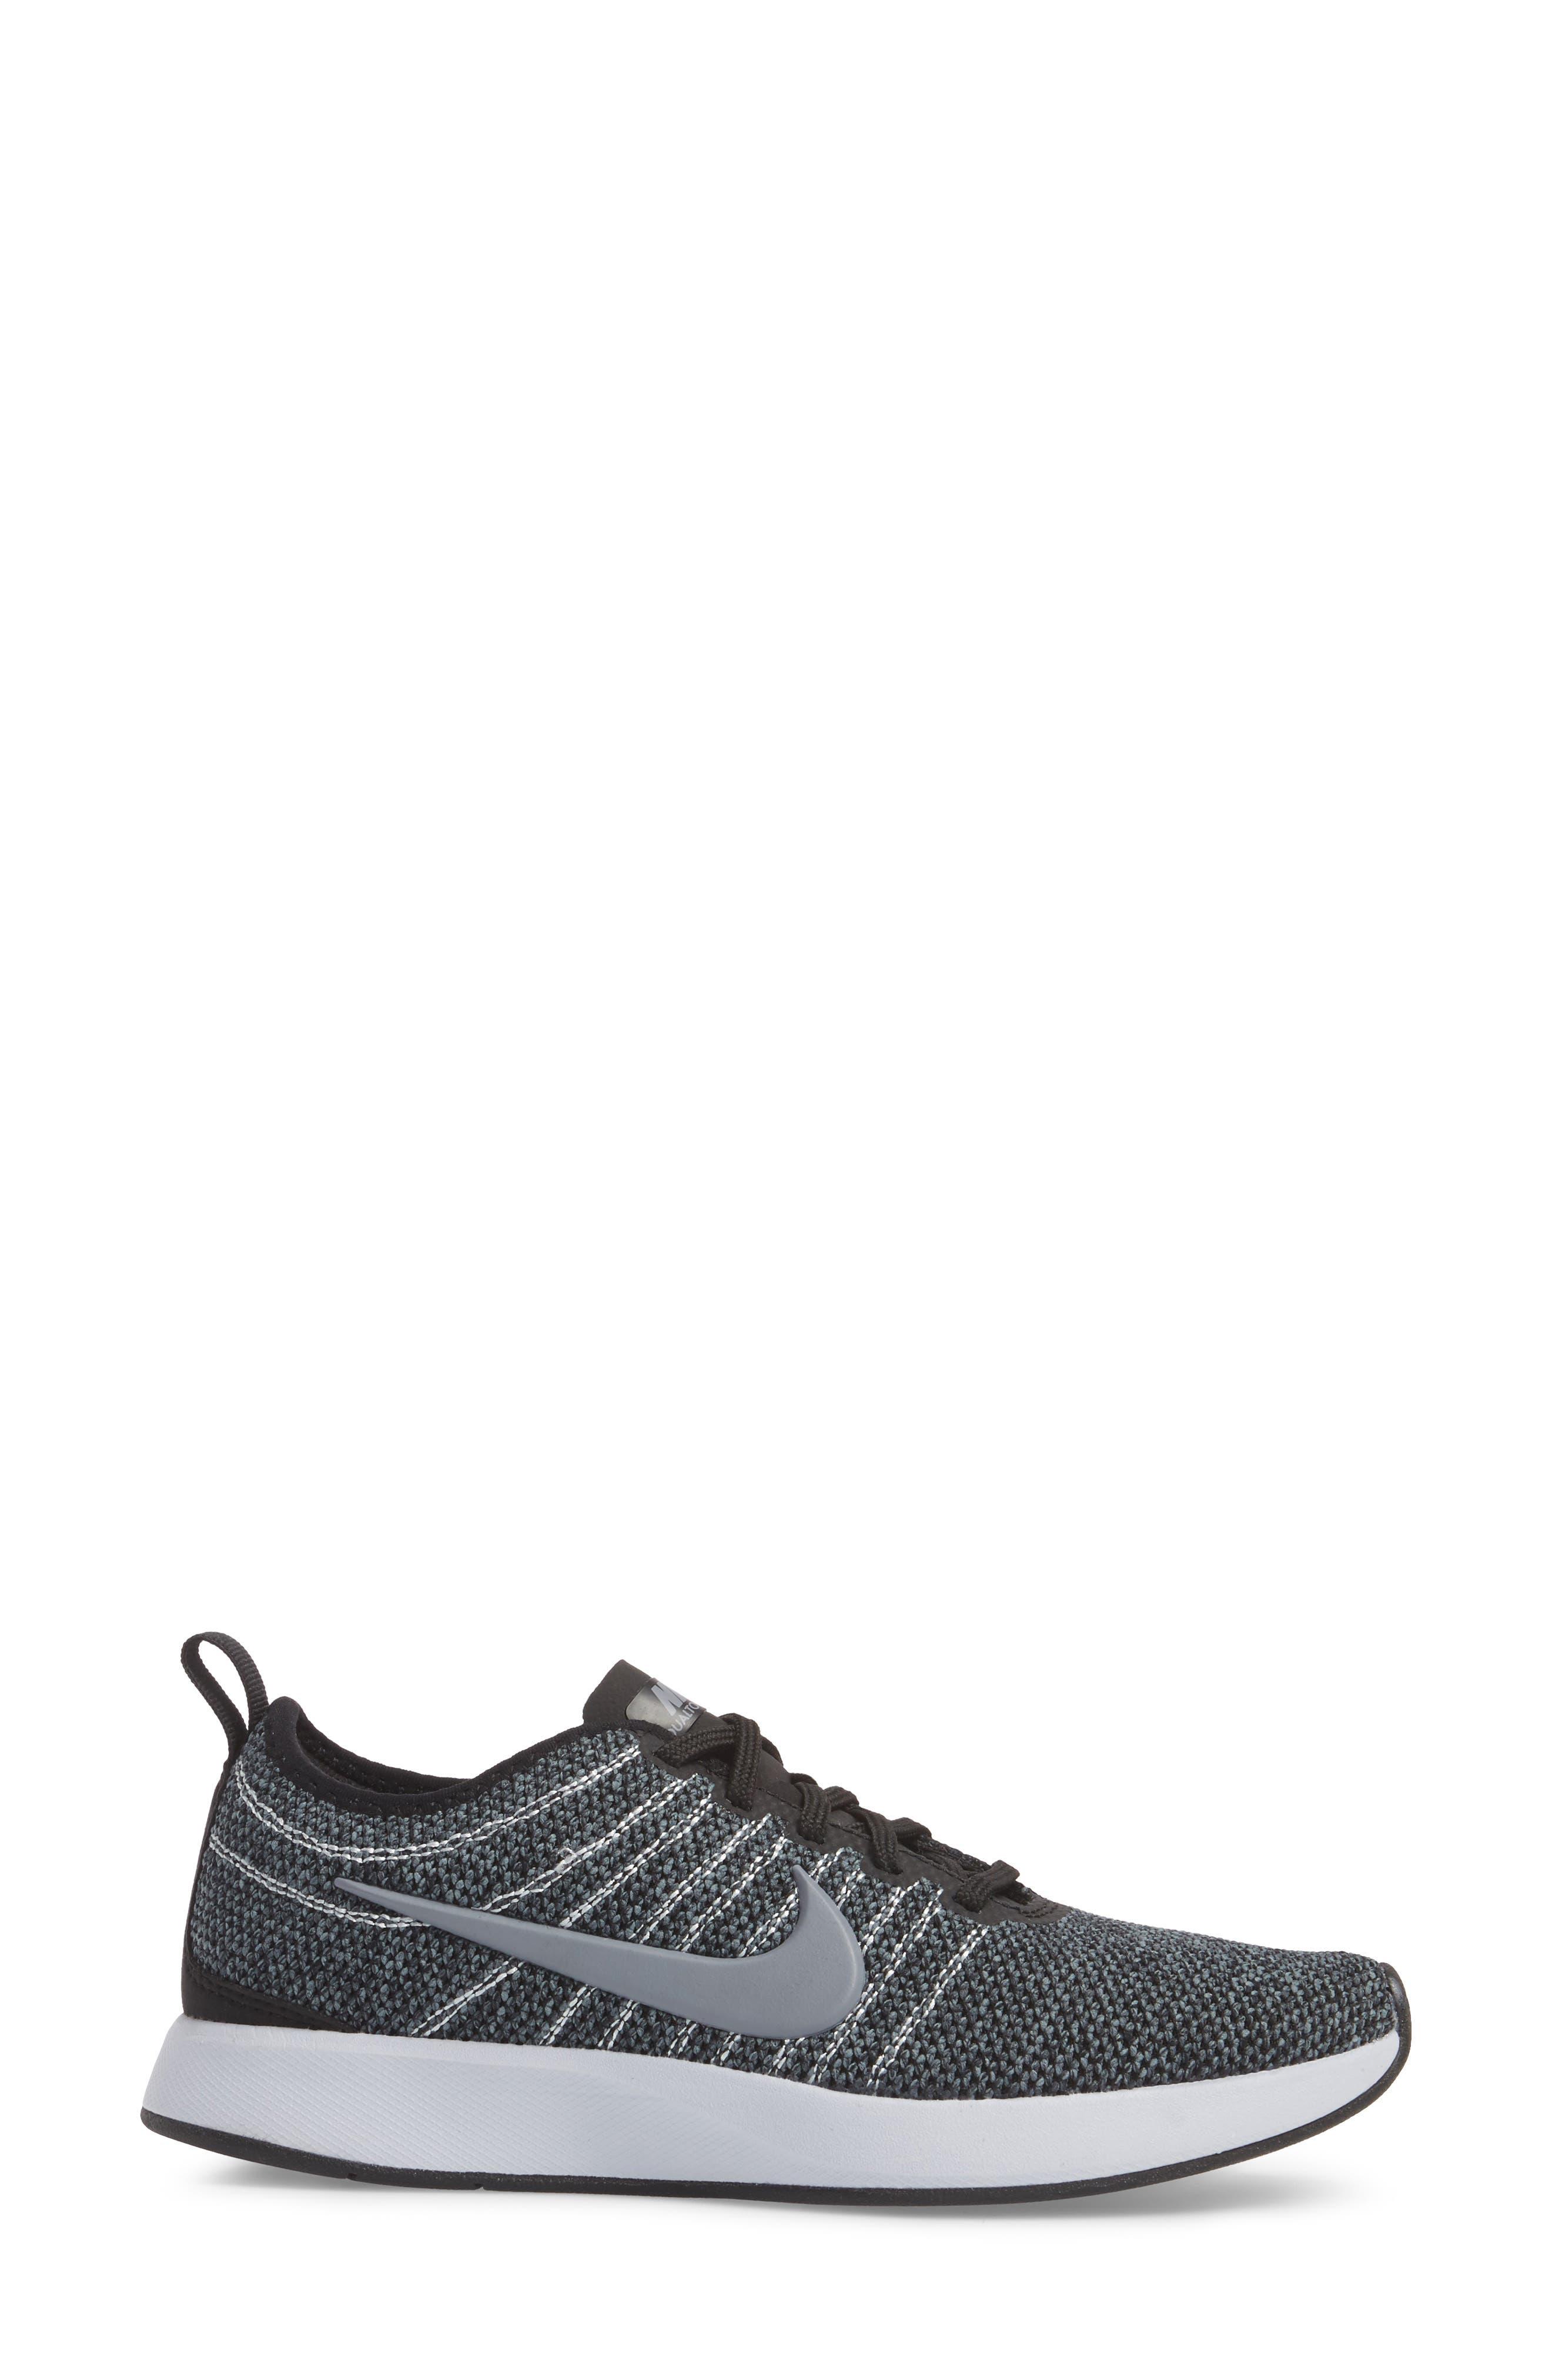 Dualtone Racer PRM Sneaker,                             Alternate thumbnail 9, color,